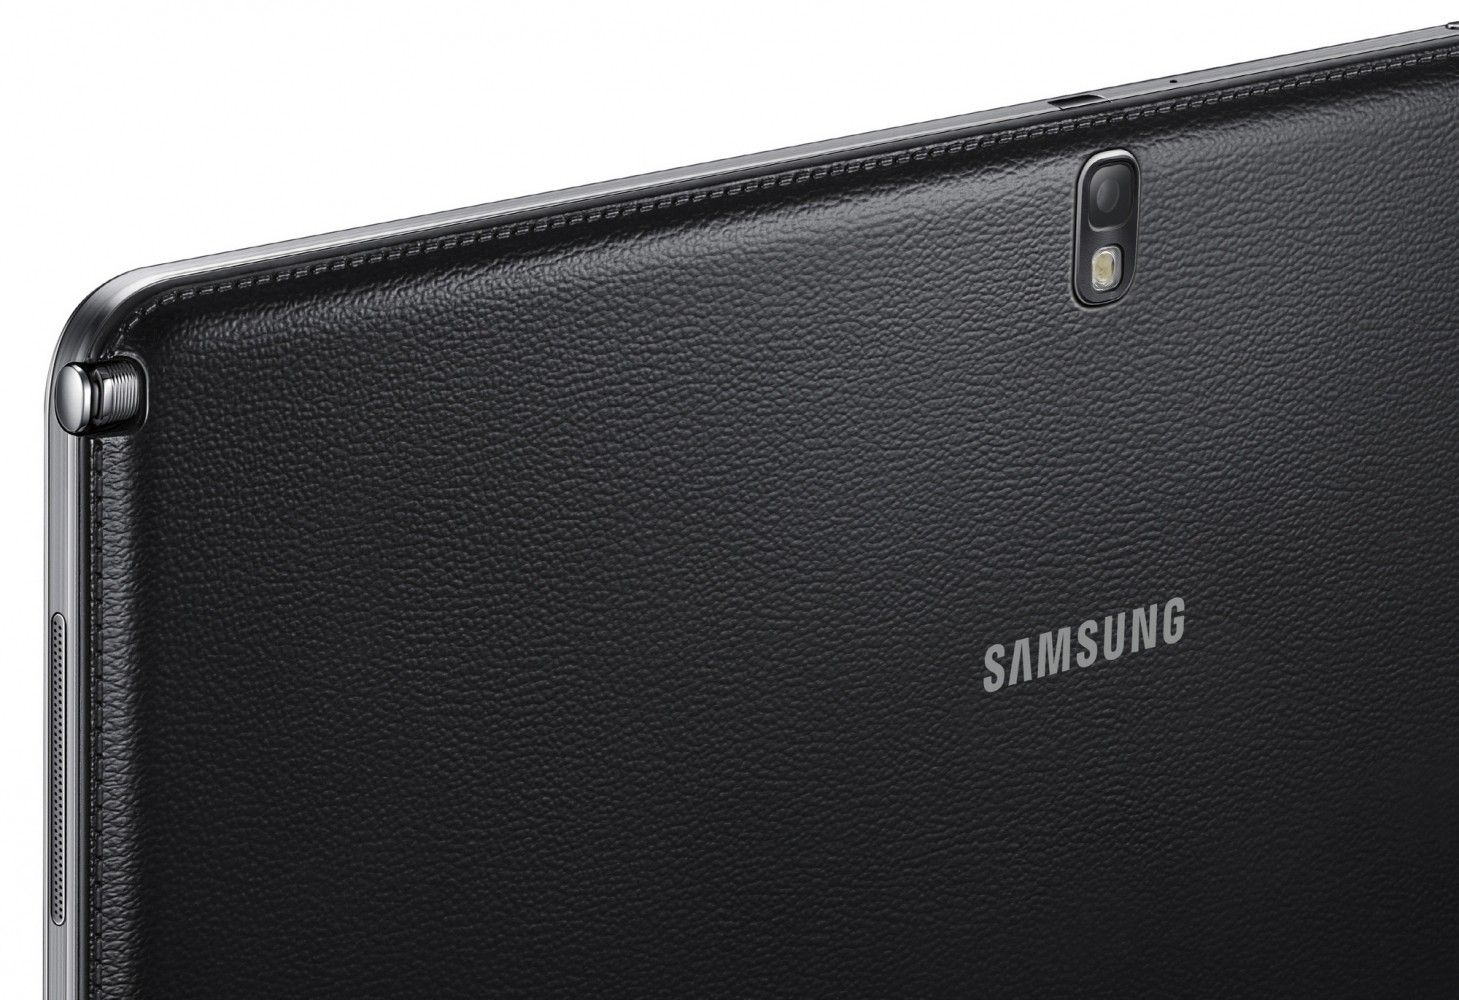 Планшет Samsung Galaxy Note Pro 12.2 32GB 3G Black (SM-P9010ZKASEK) - 4